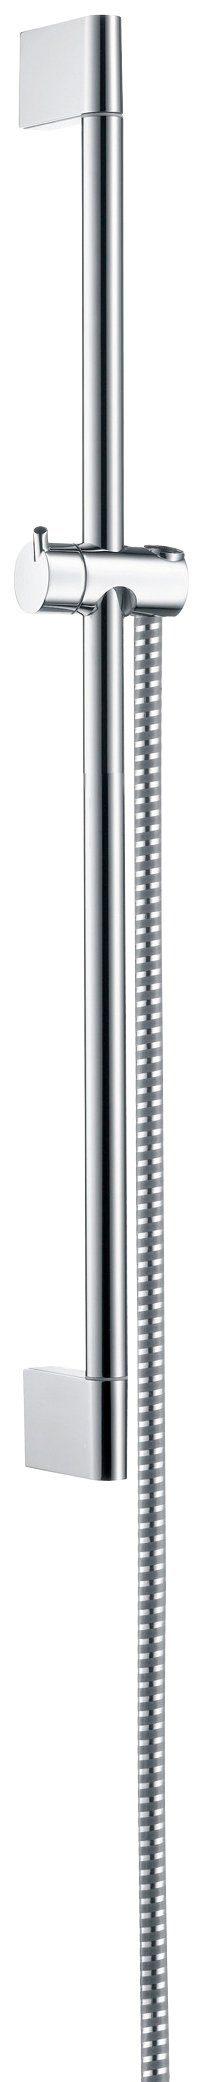 HANSGROHE Brausestange »Crometta«, 65 cm